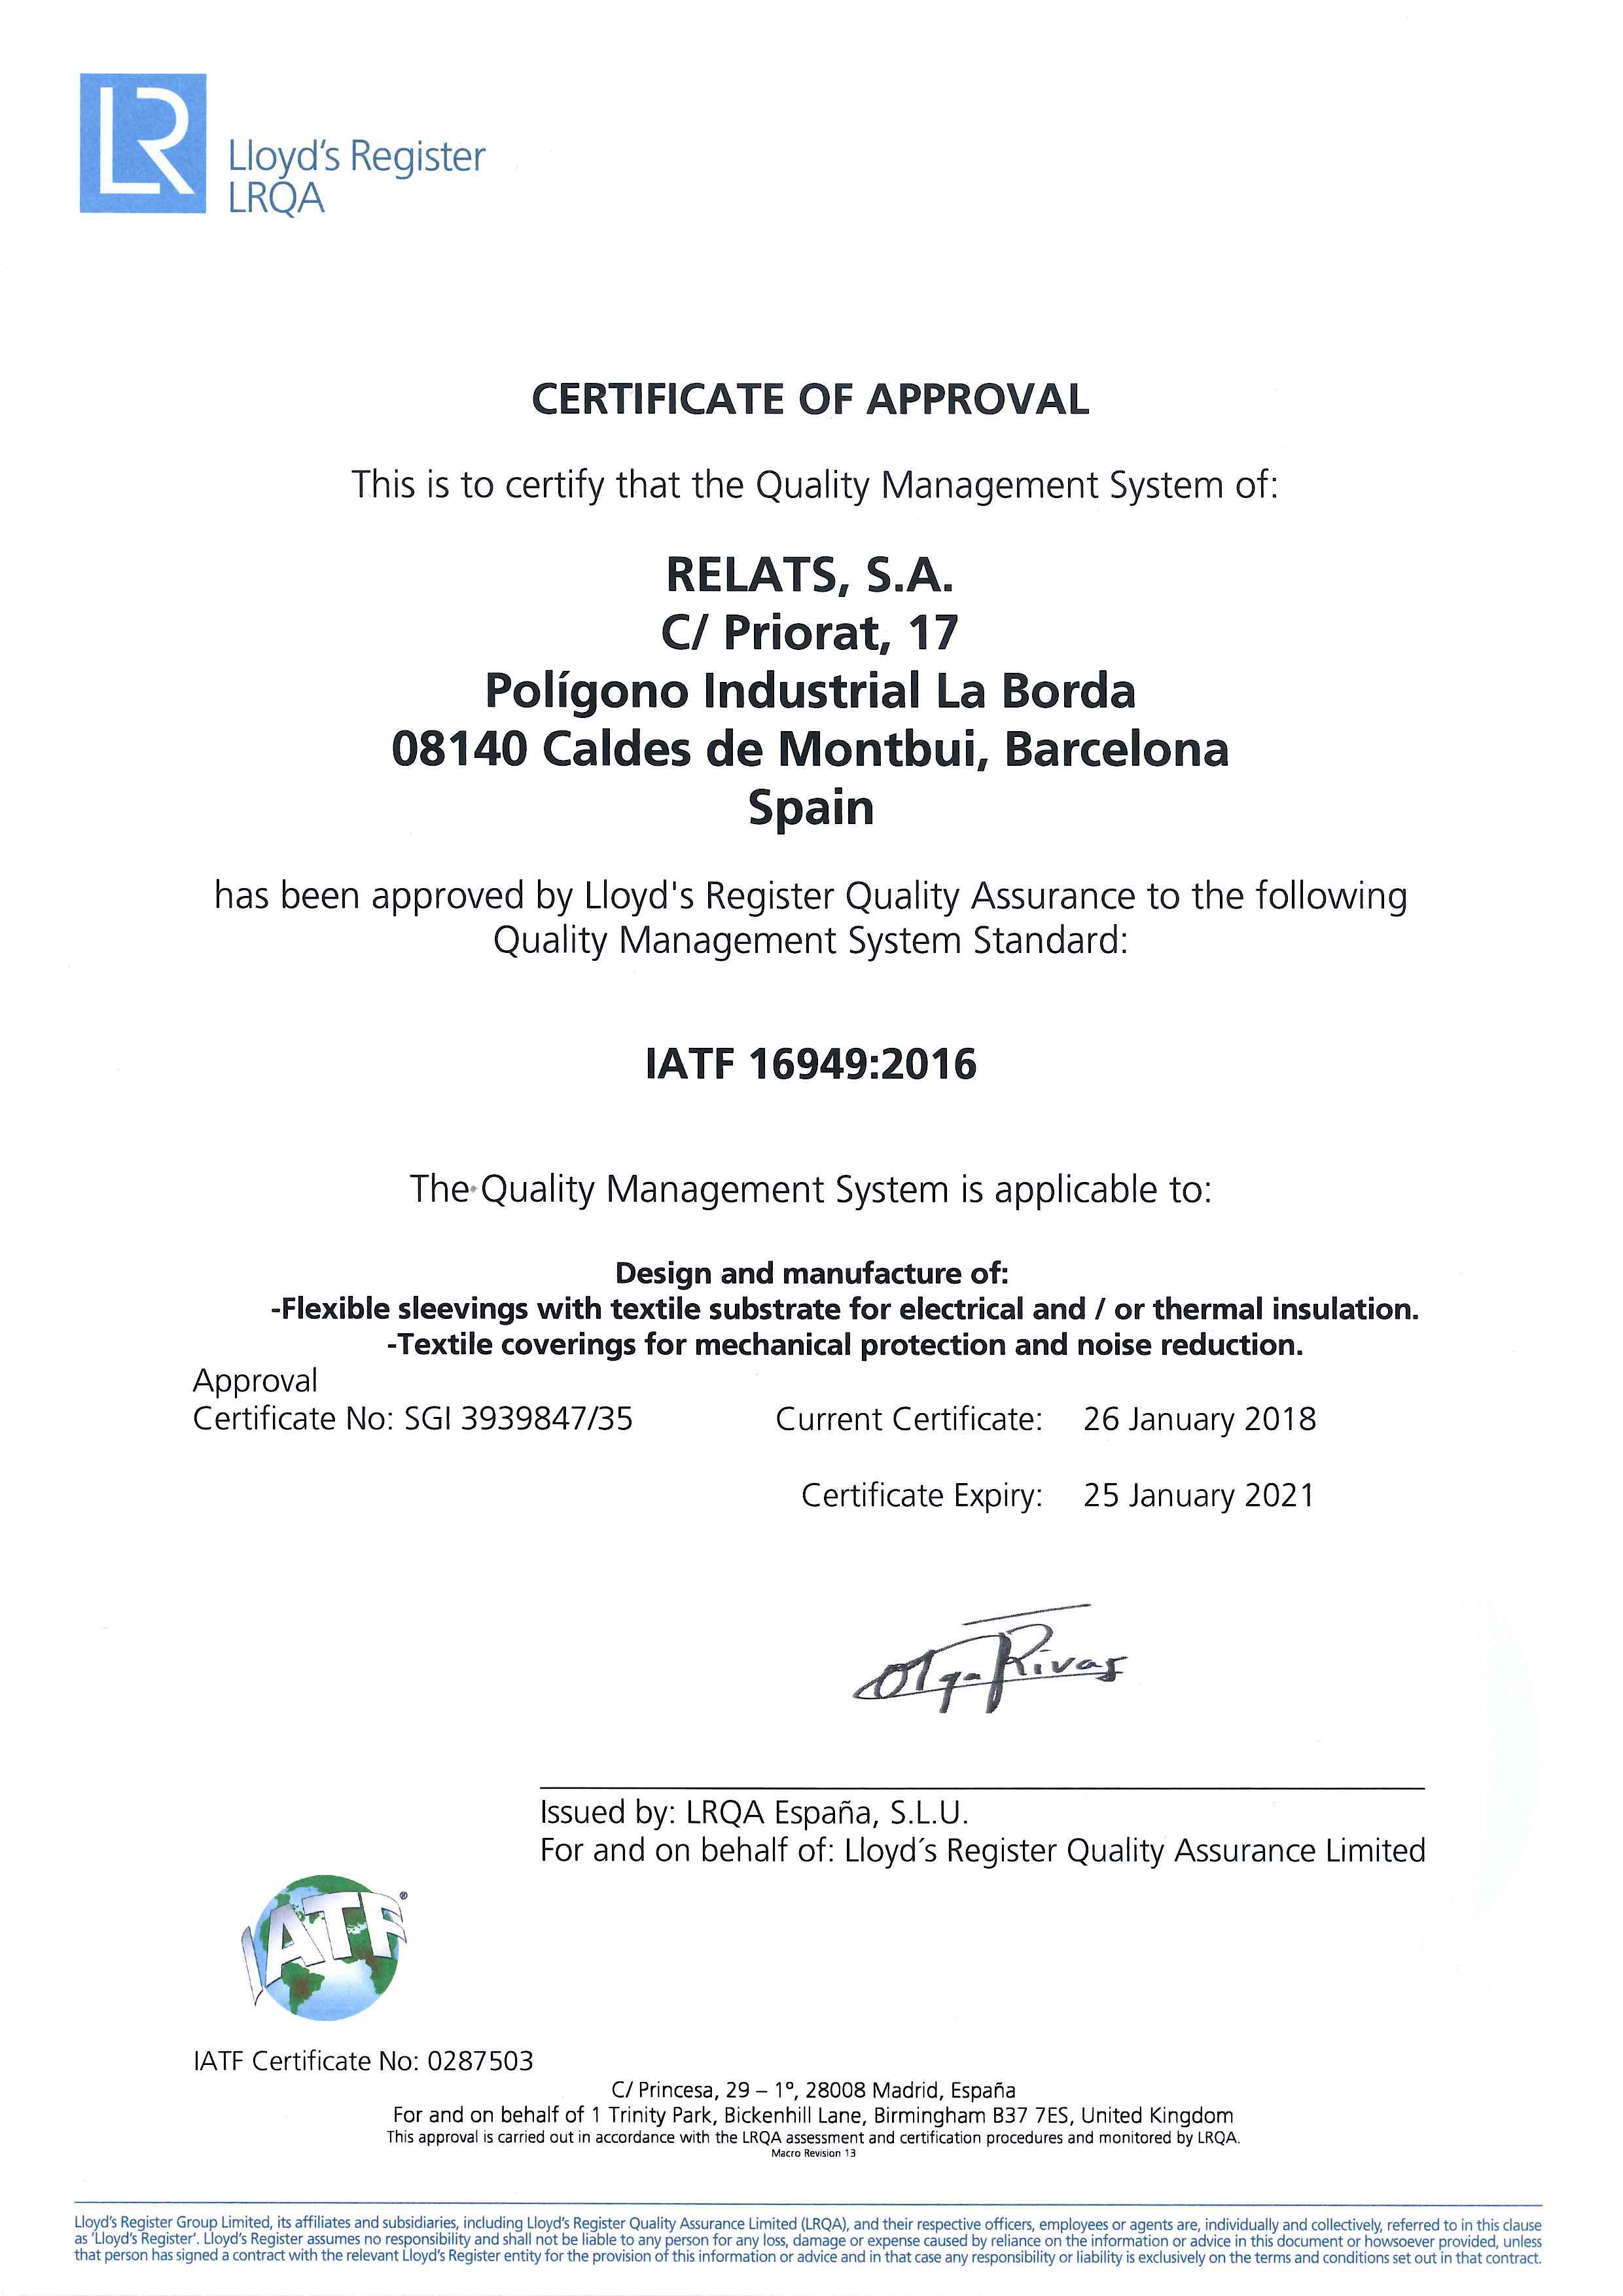 IATF 16949:2016 Certificat Relats Caldes de Montbui